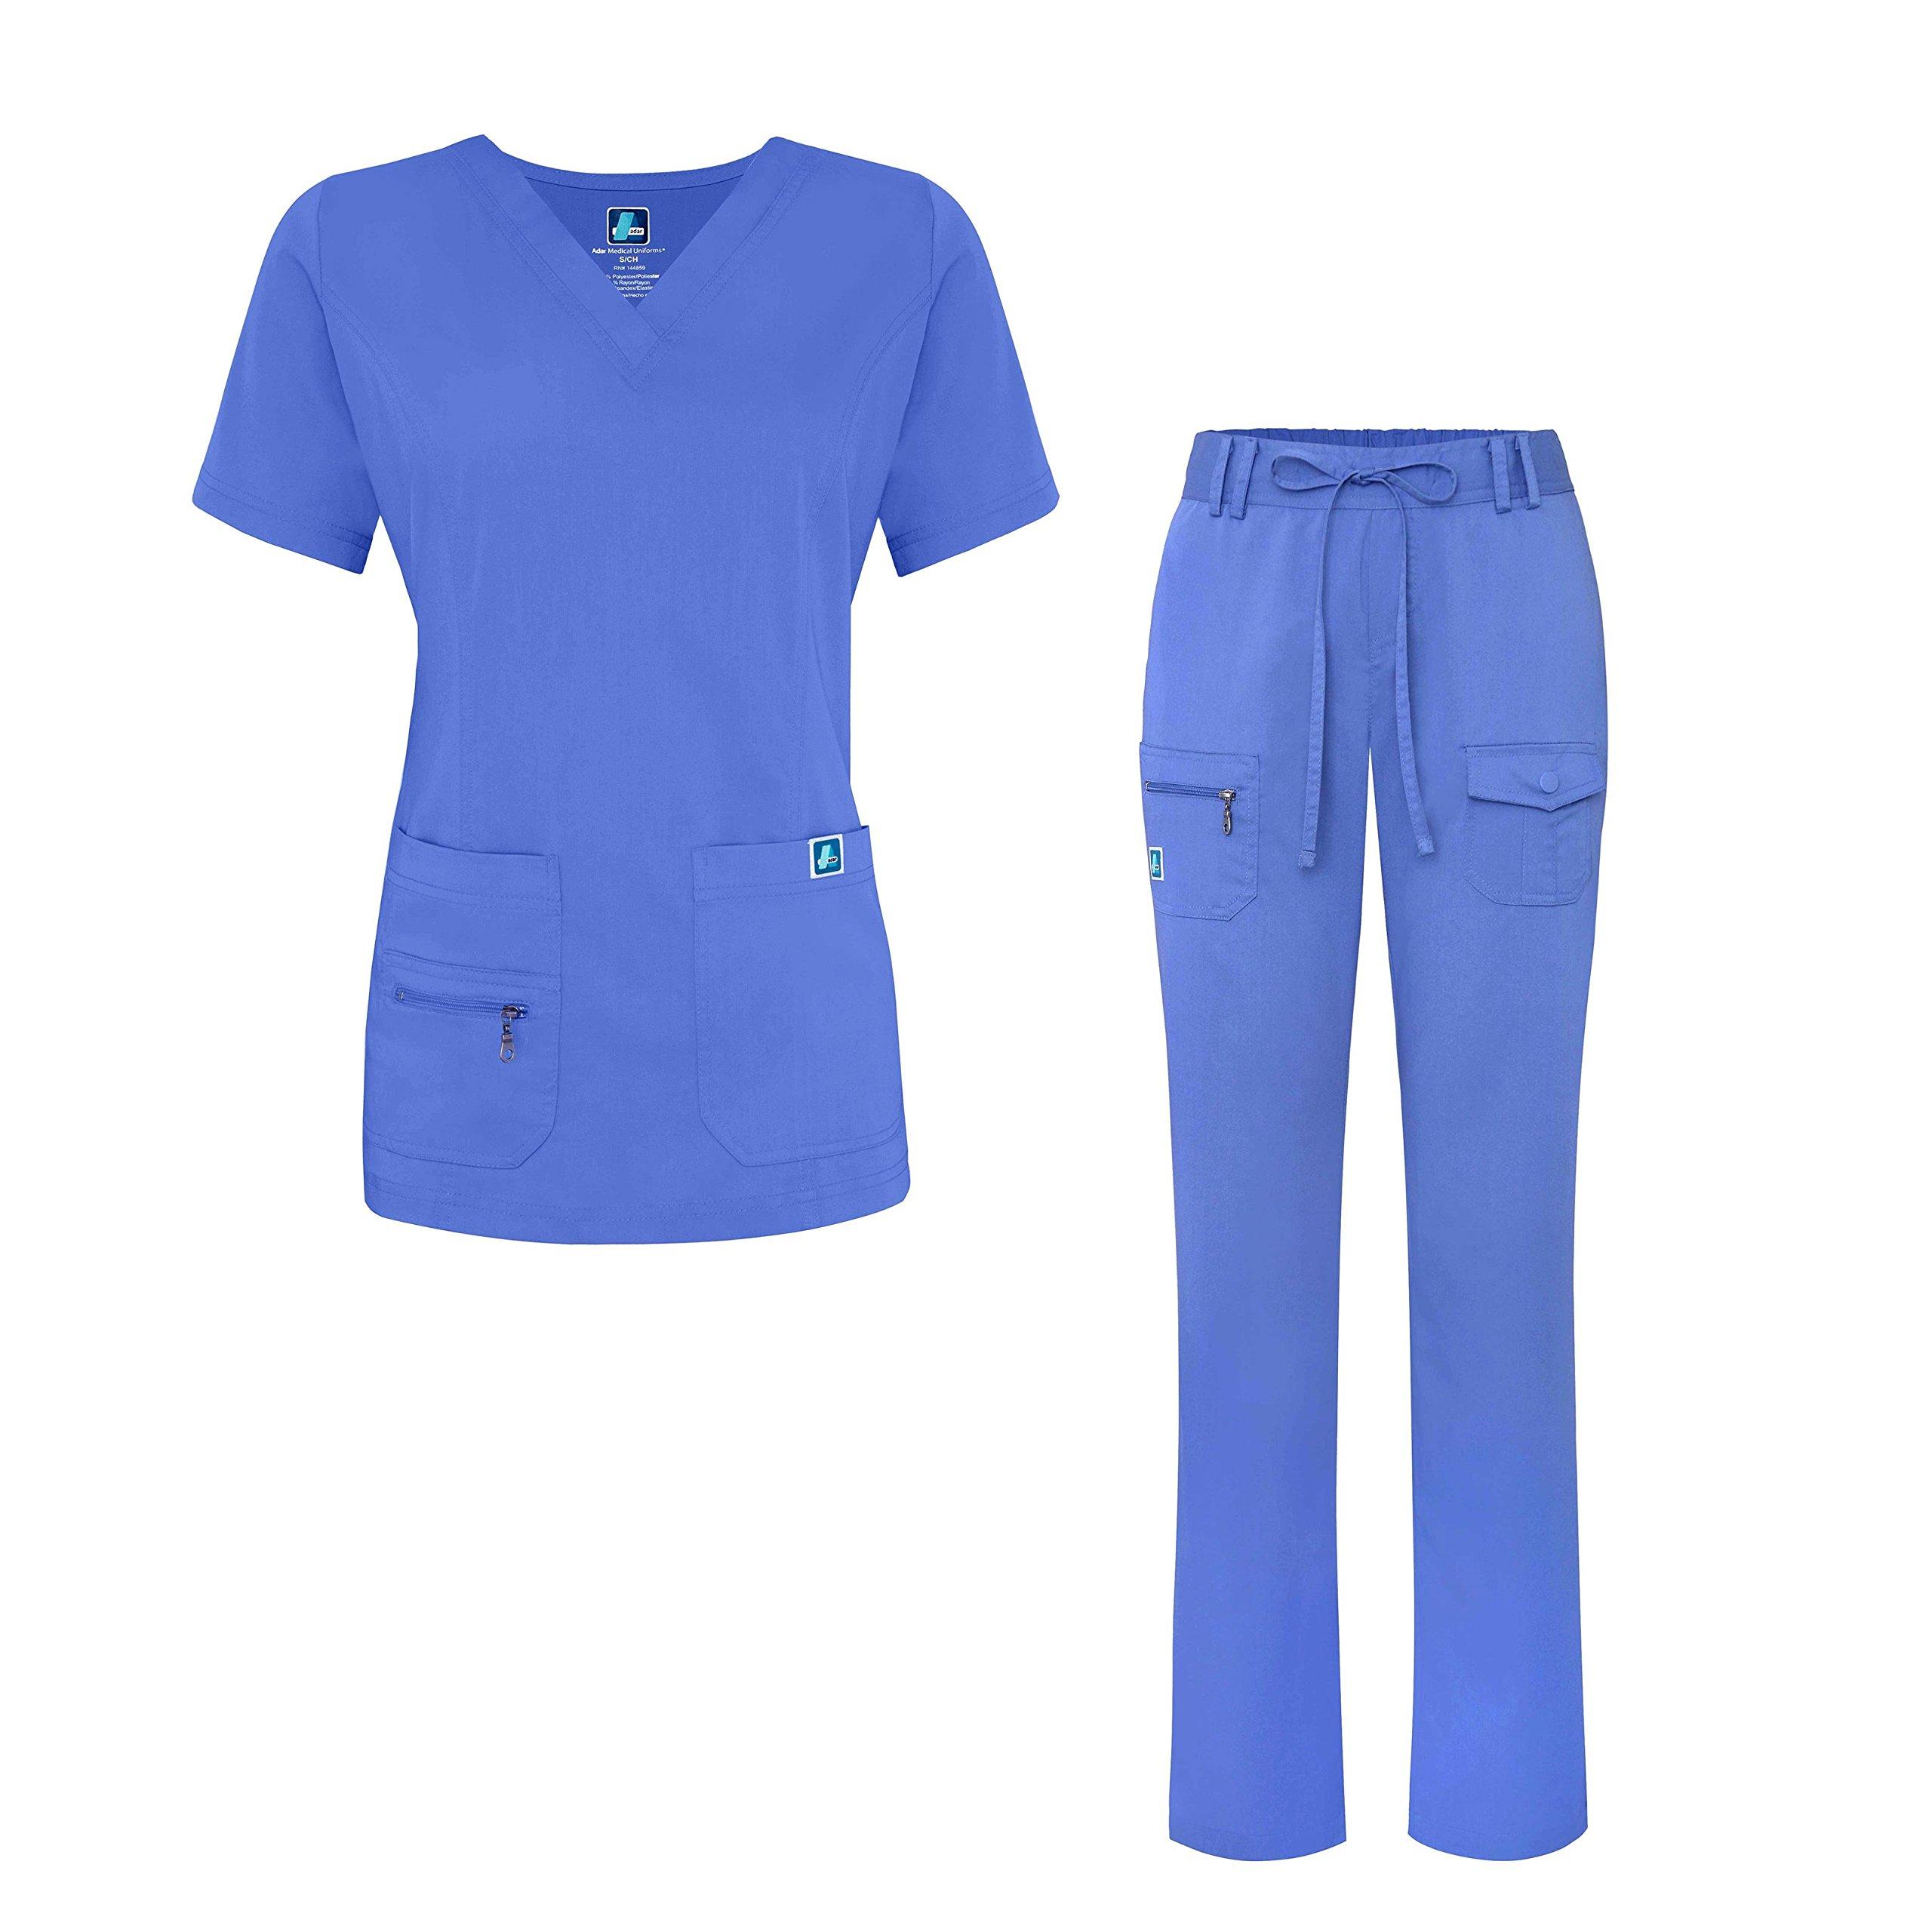 Adar Indulgence Jr. Fit Women's Scrub Set - Enhanced V-Neck Top/Multi Pocket Pants - 4400 - Ceil Blue - S